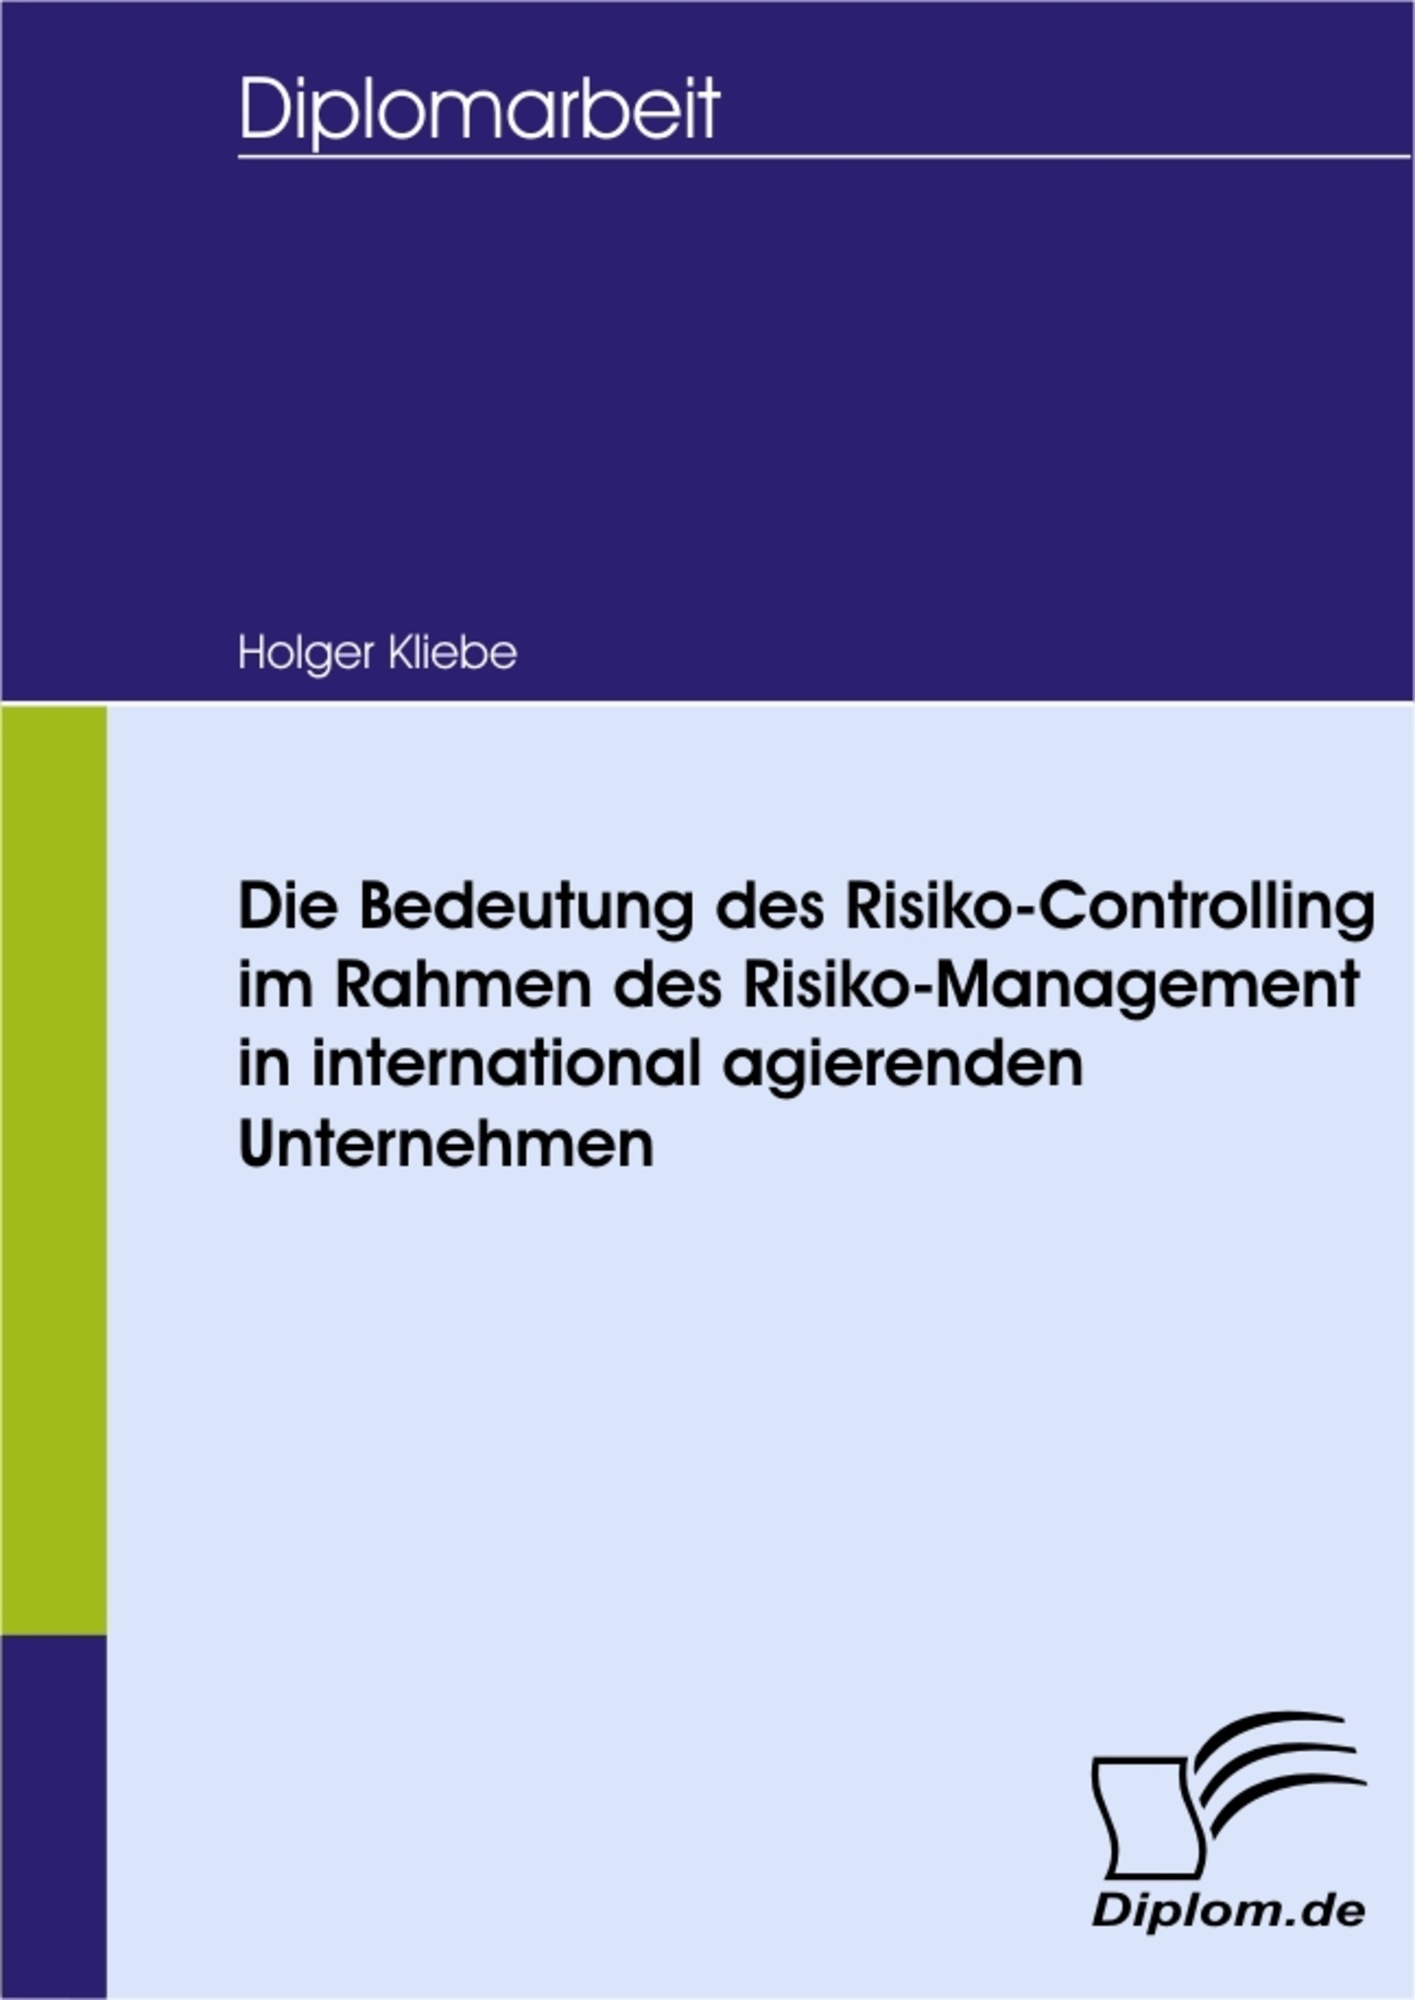 Die Bedeutung des Risiko-Controlling im Rahmen des ...